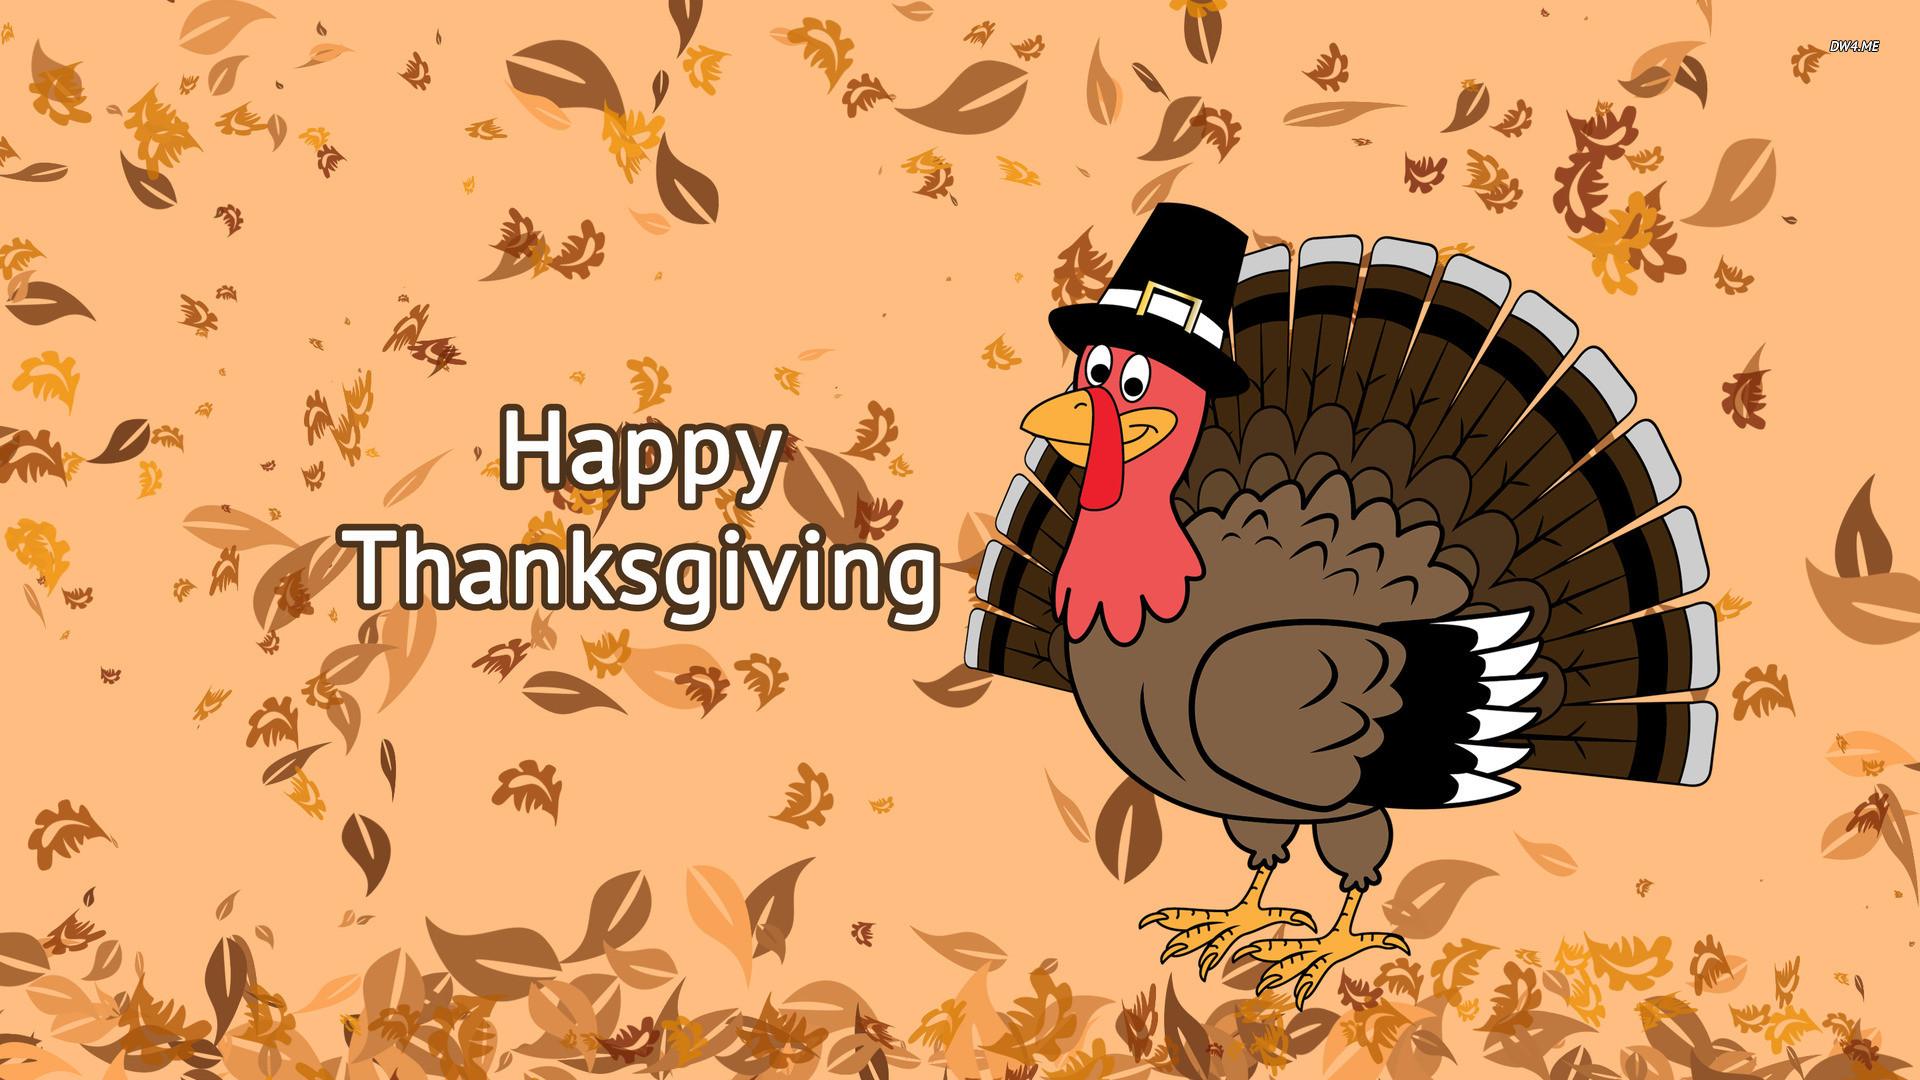 Filename: 970-happy-thanksgiving-1920×1080-holiday-wallpaper.jpg